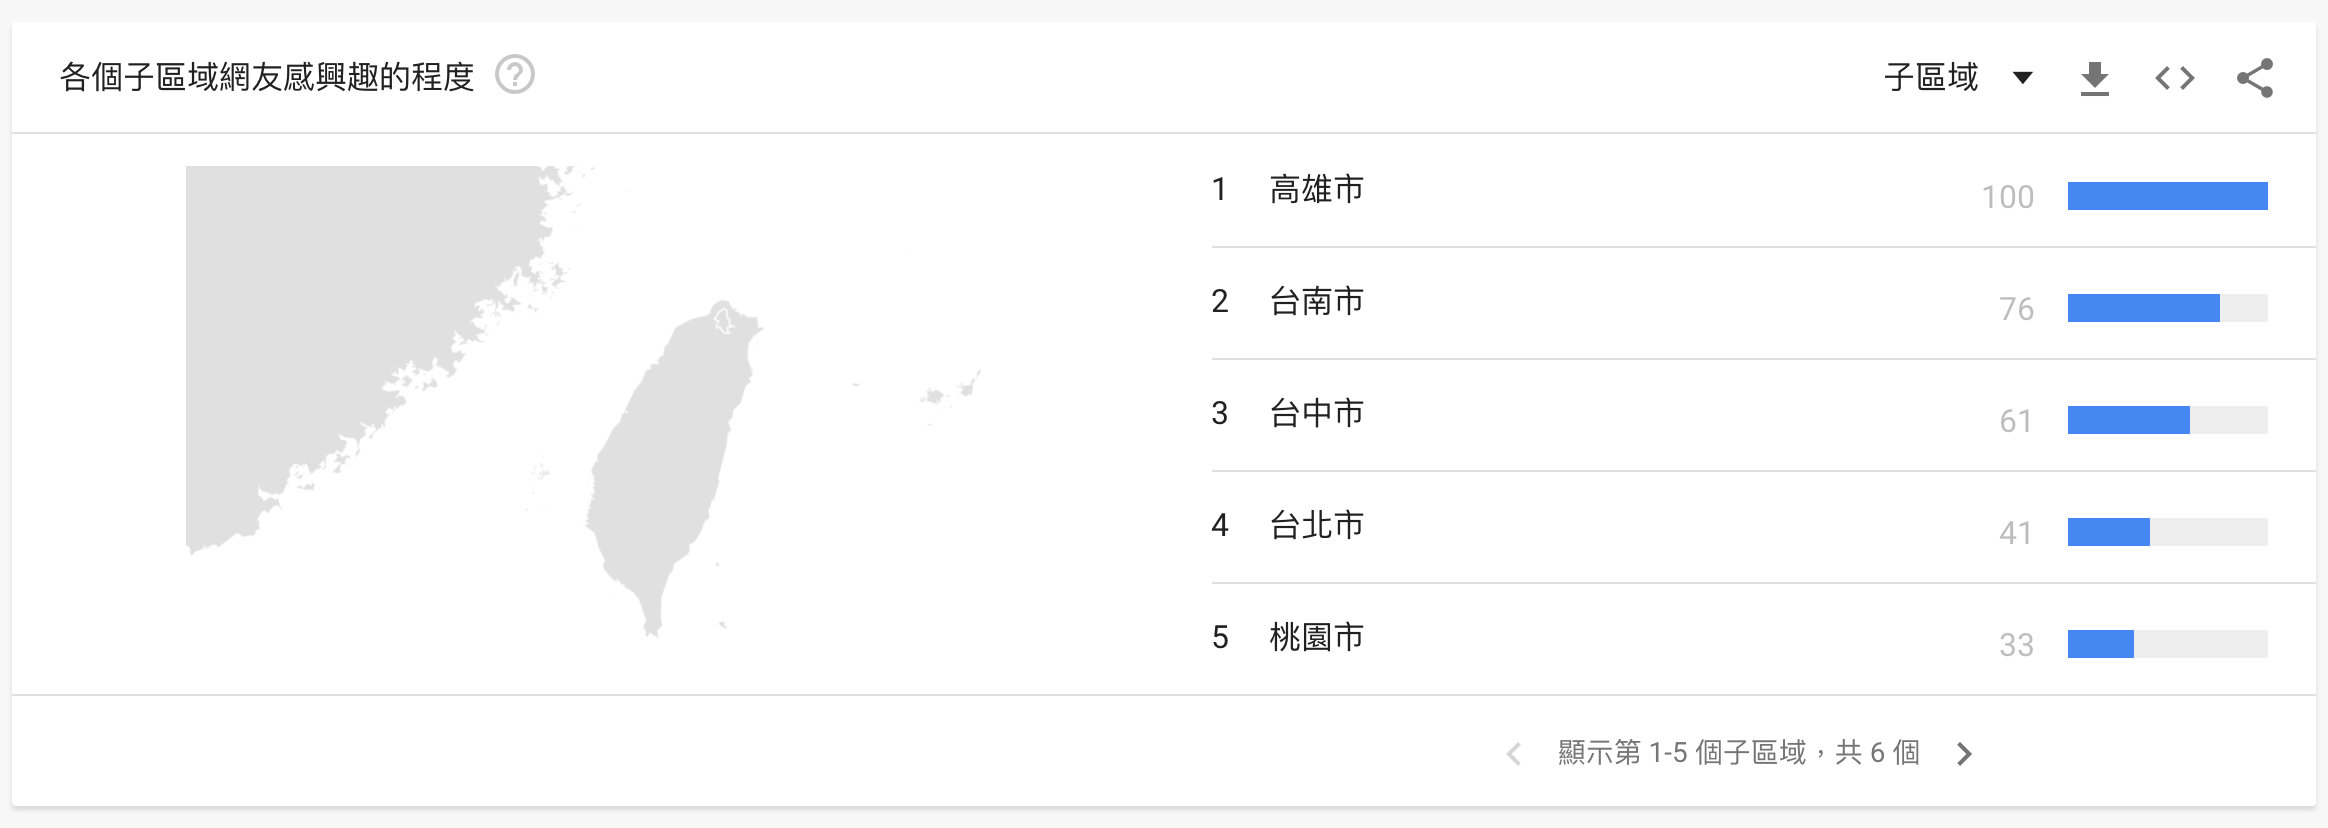 Google Trends 找尋各個子區域網友感興趣的程度